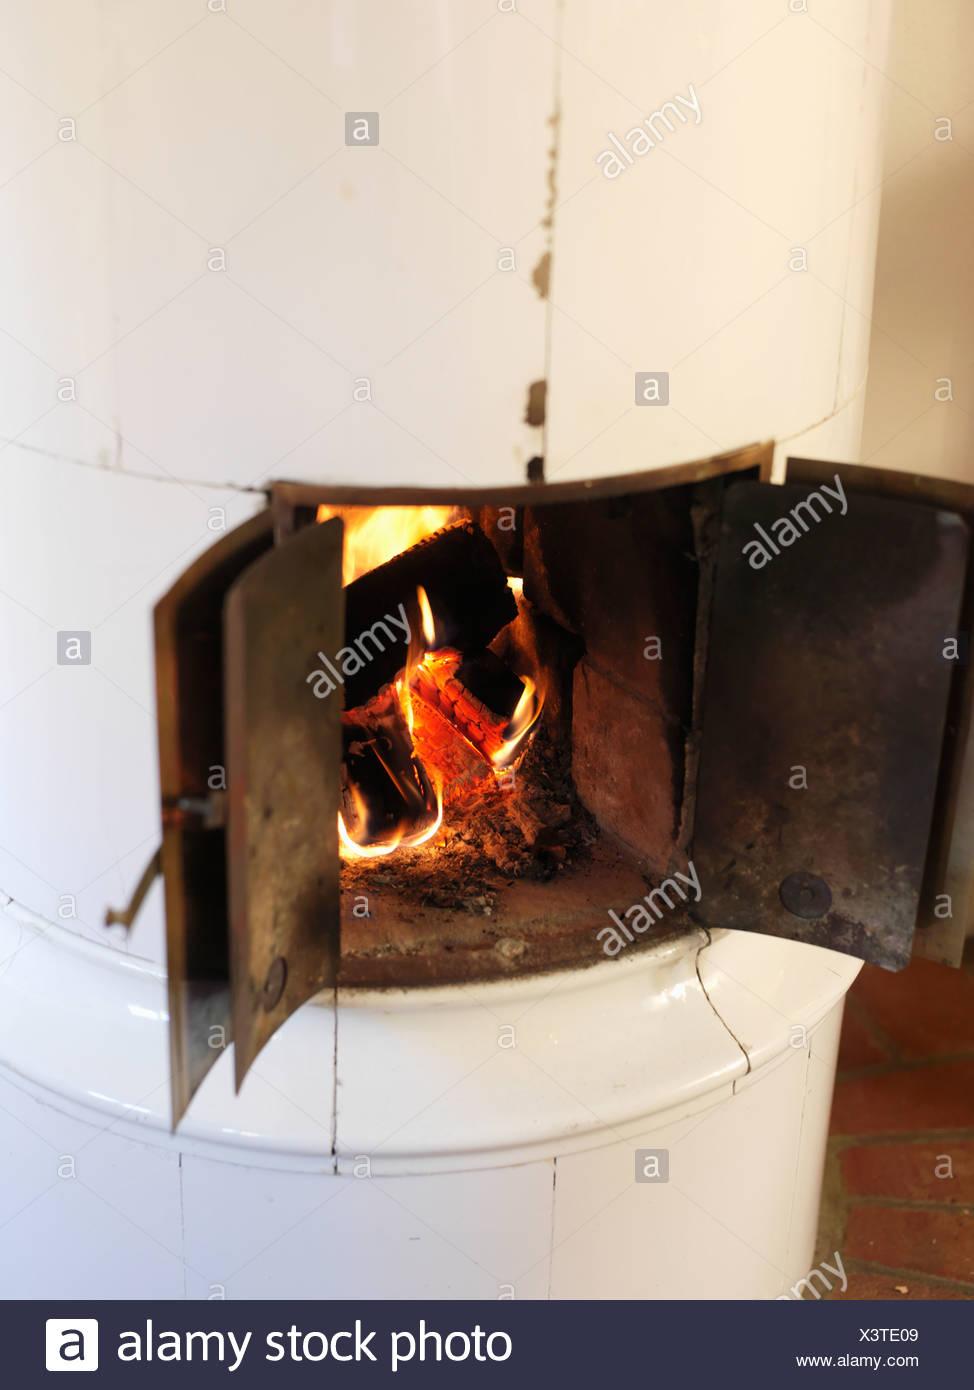 Tiled stove, Sweden. - Stock Image